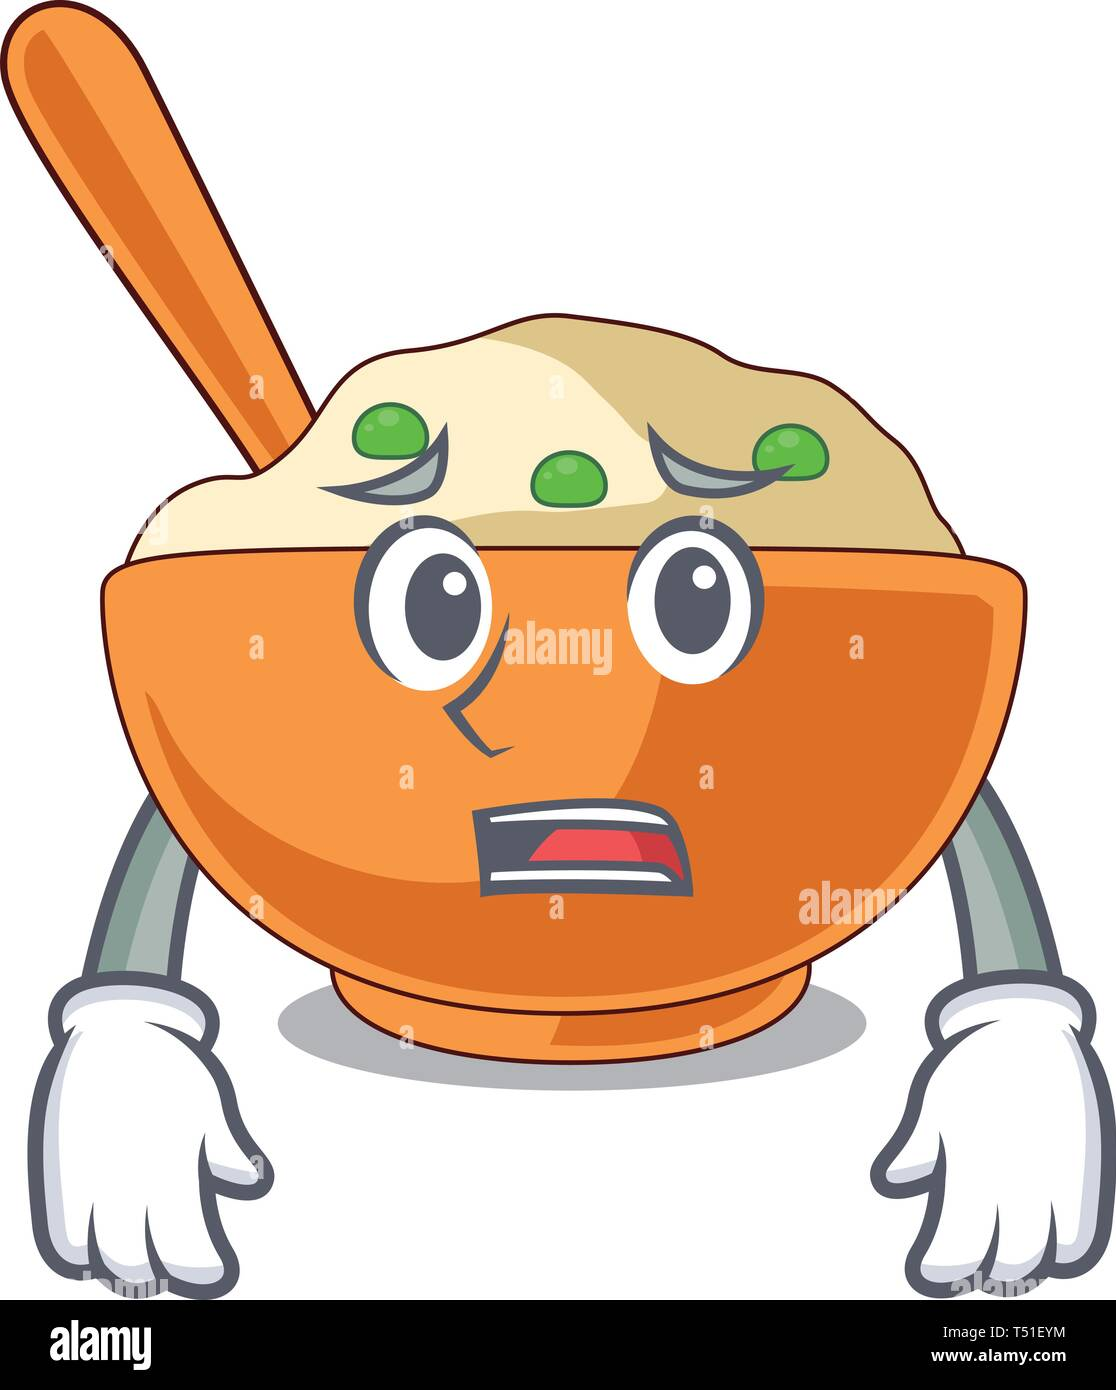 Afraid mashed potato in the shape mascot - Stock Vector